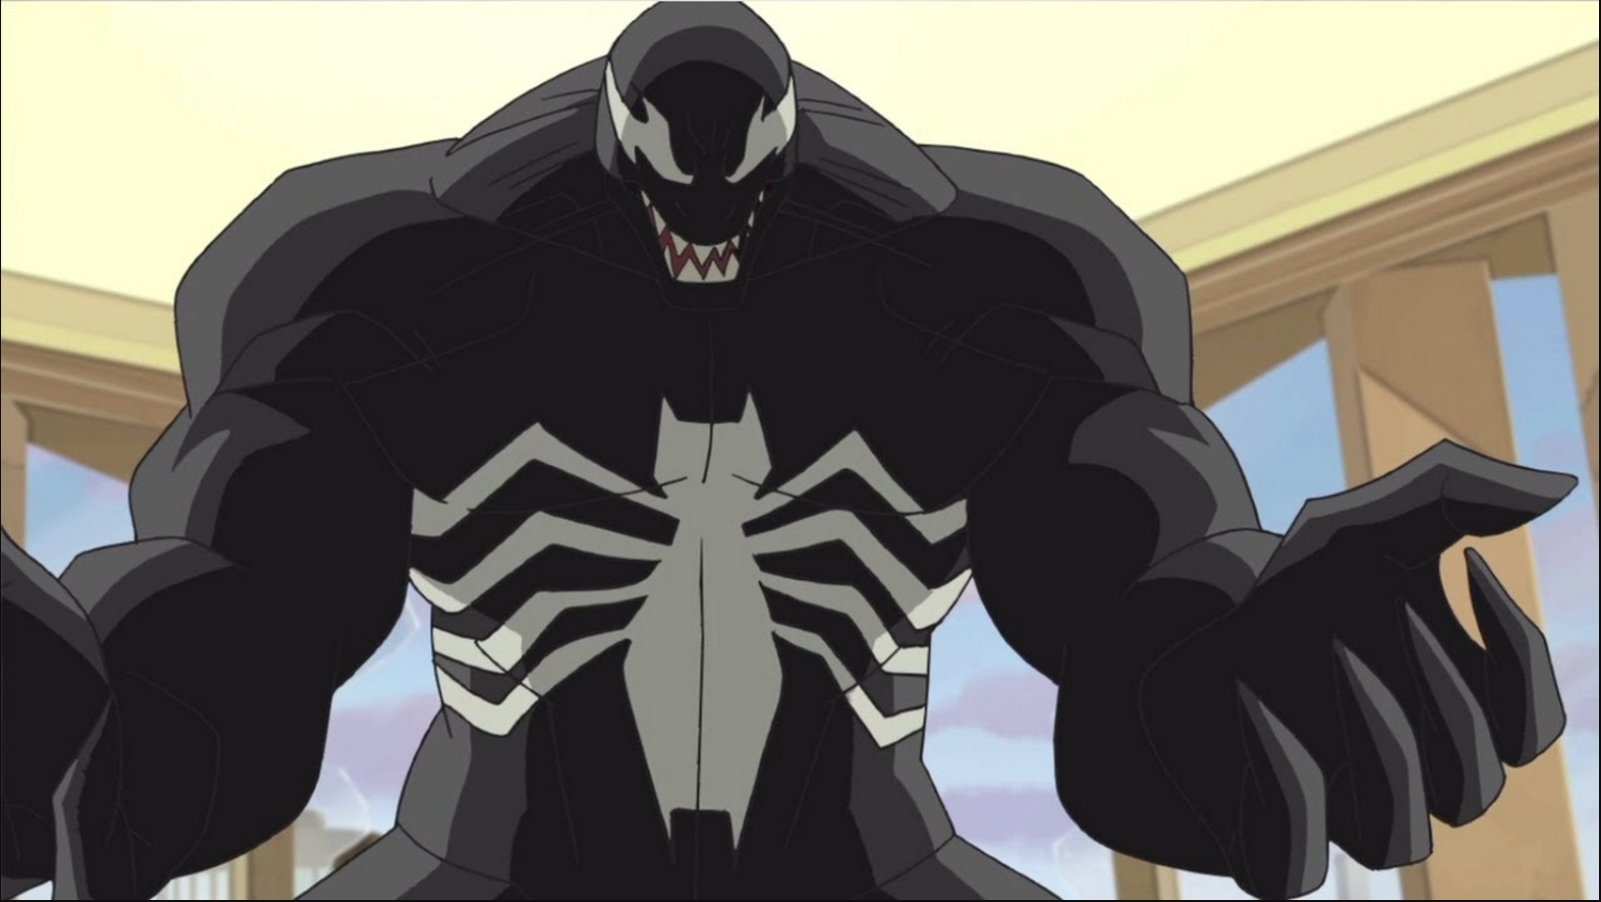 Venom (Ultimate Spider-Man)   Spiderman animated Wikia ... - photo#38